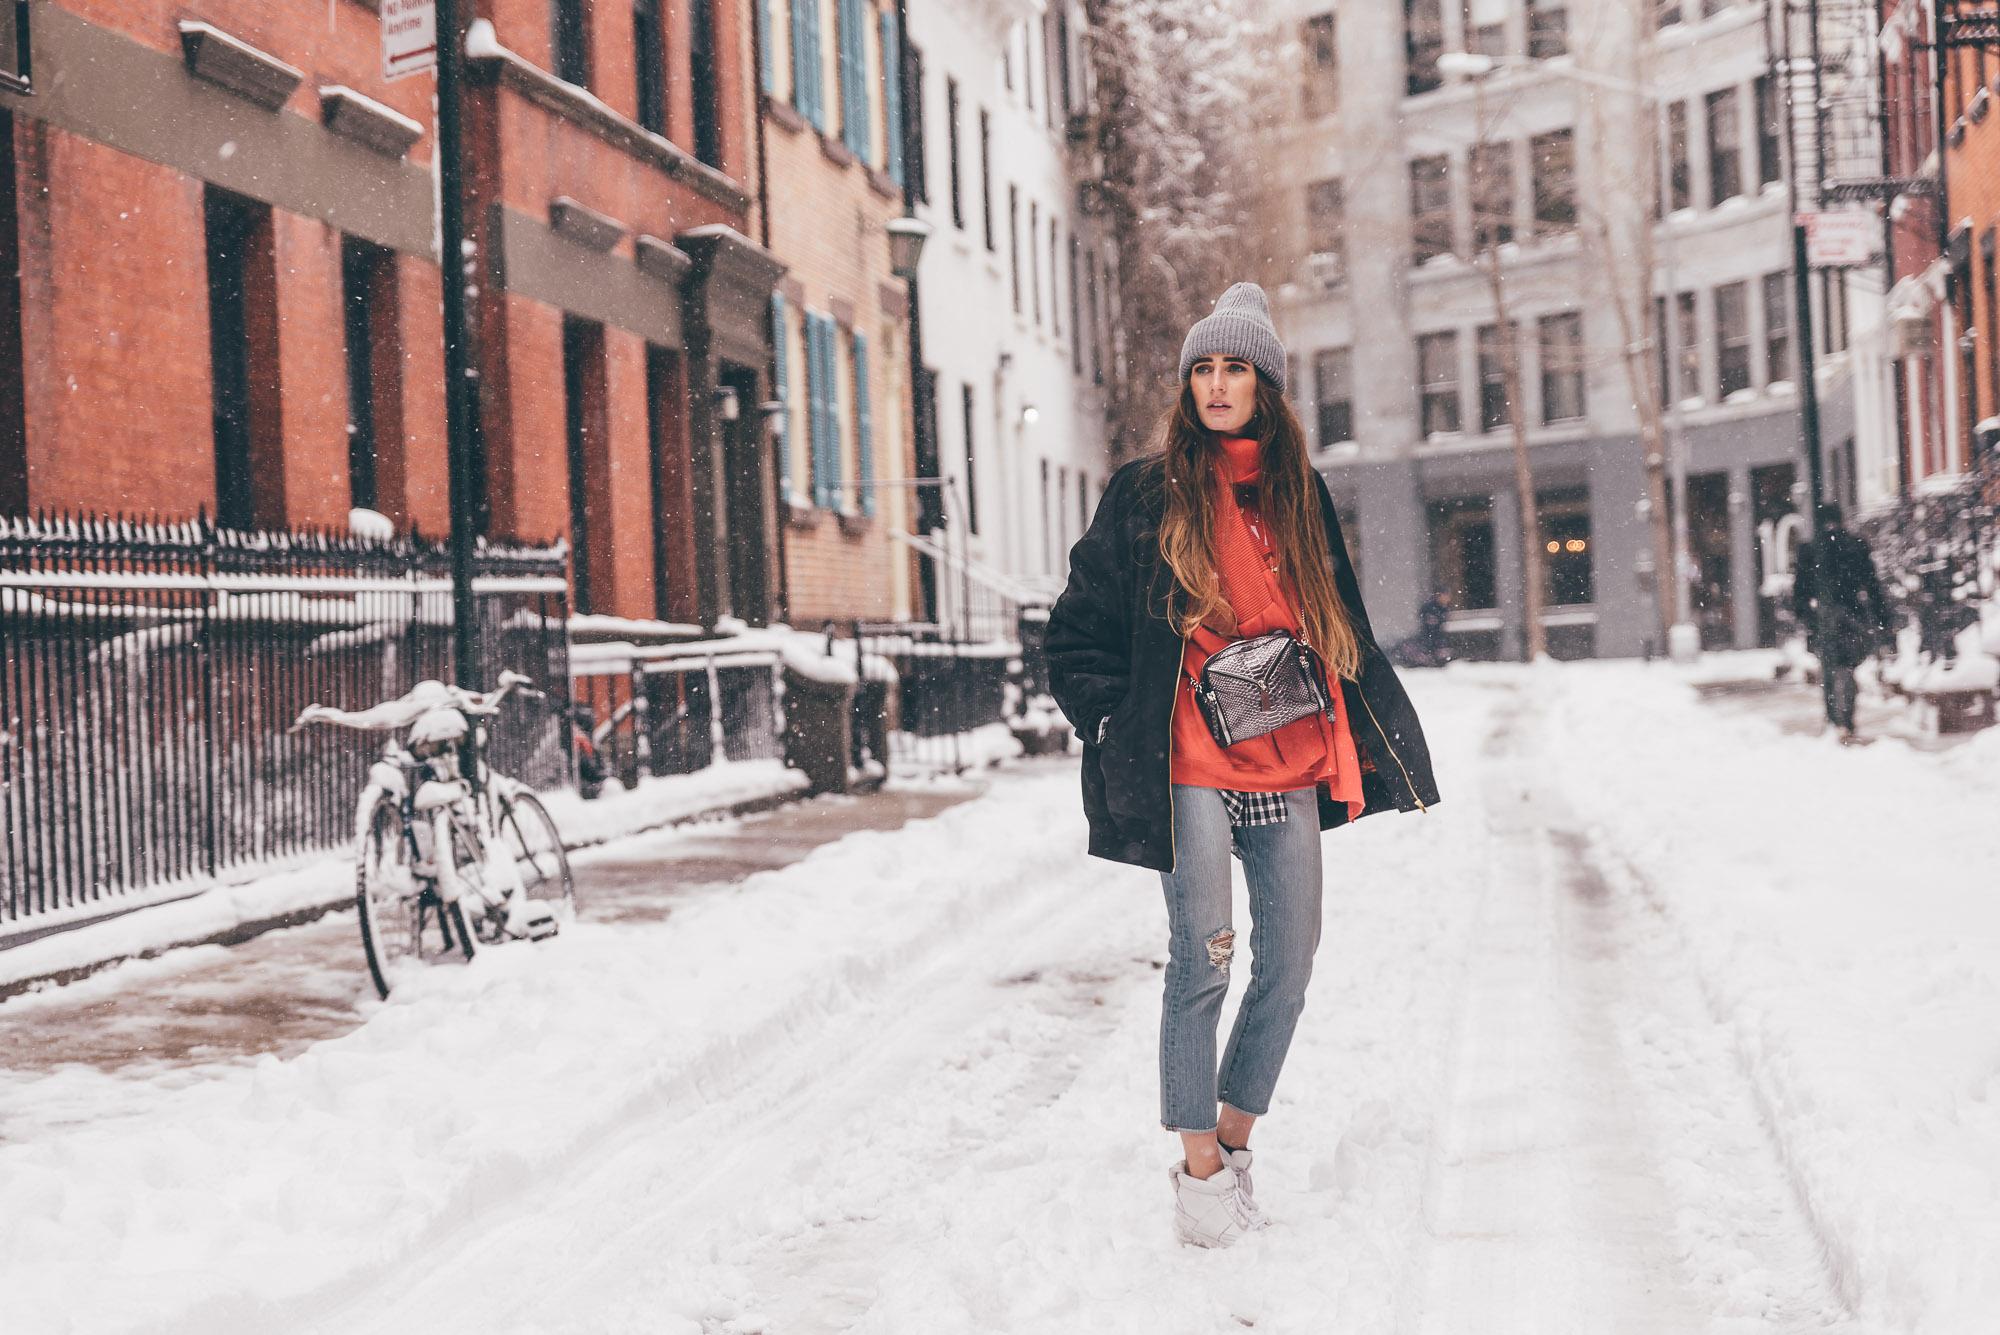 New York Snow Storm | Lisa Fiege